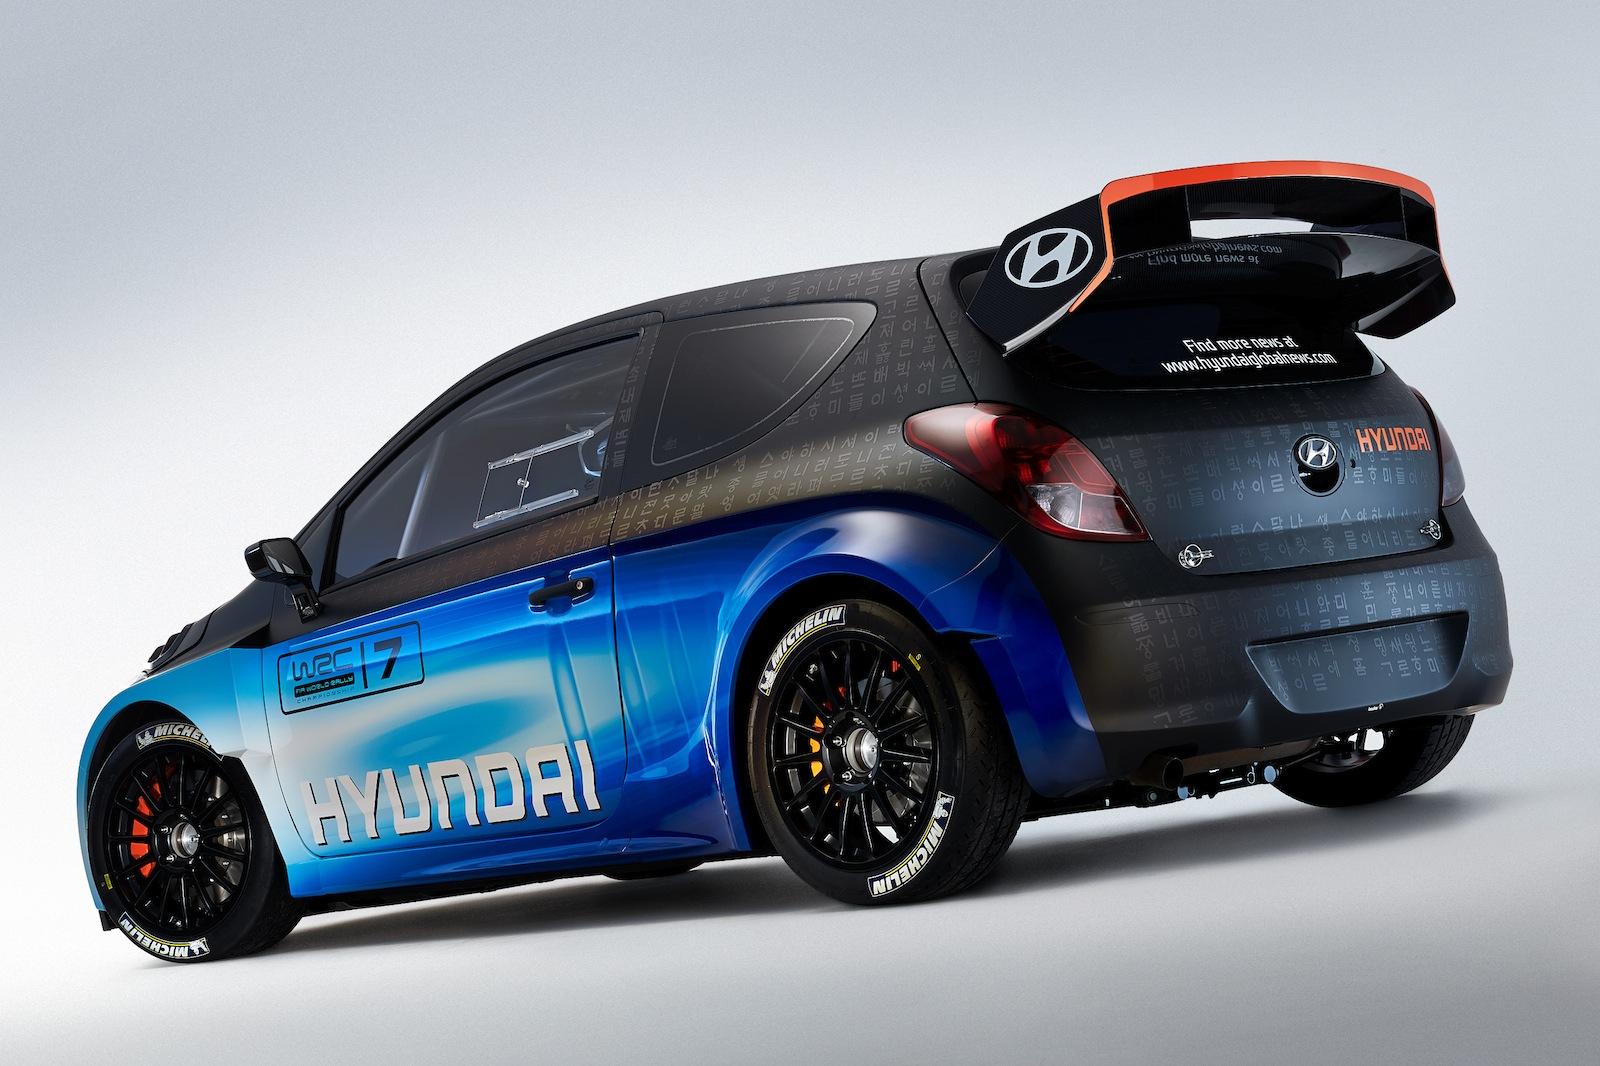 Hyundai I20 Wrc Upgraded Rally Car Unveiled At Geneva